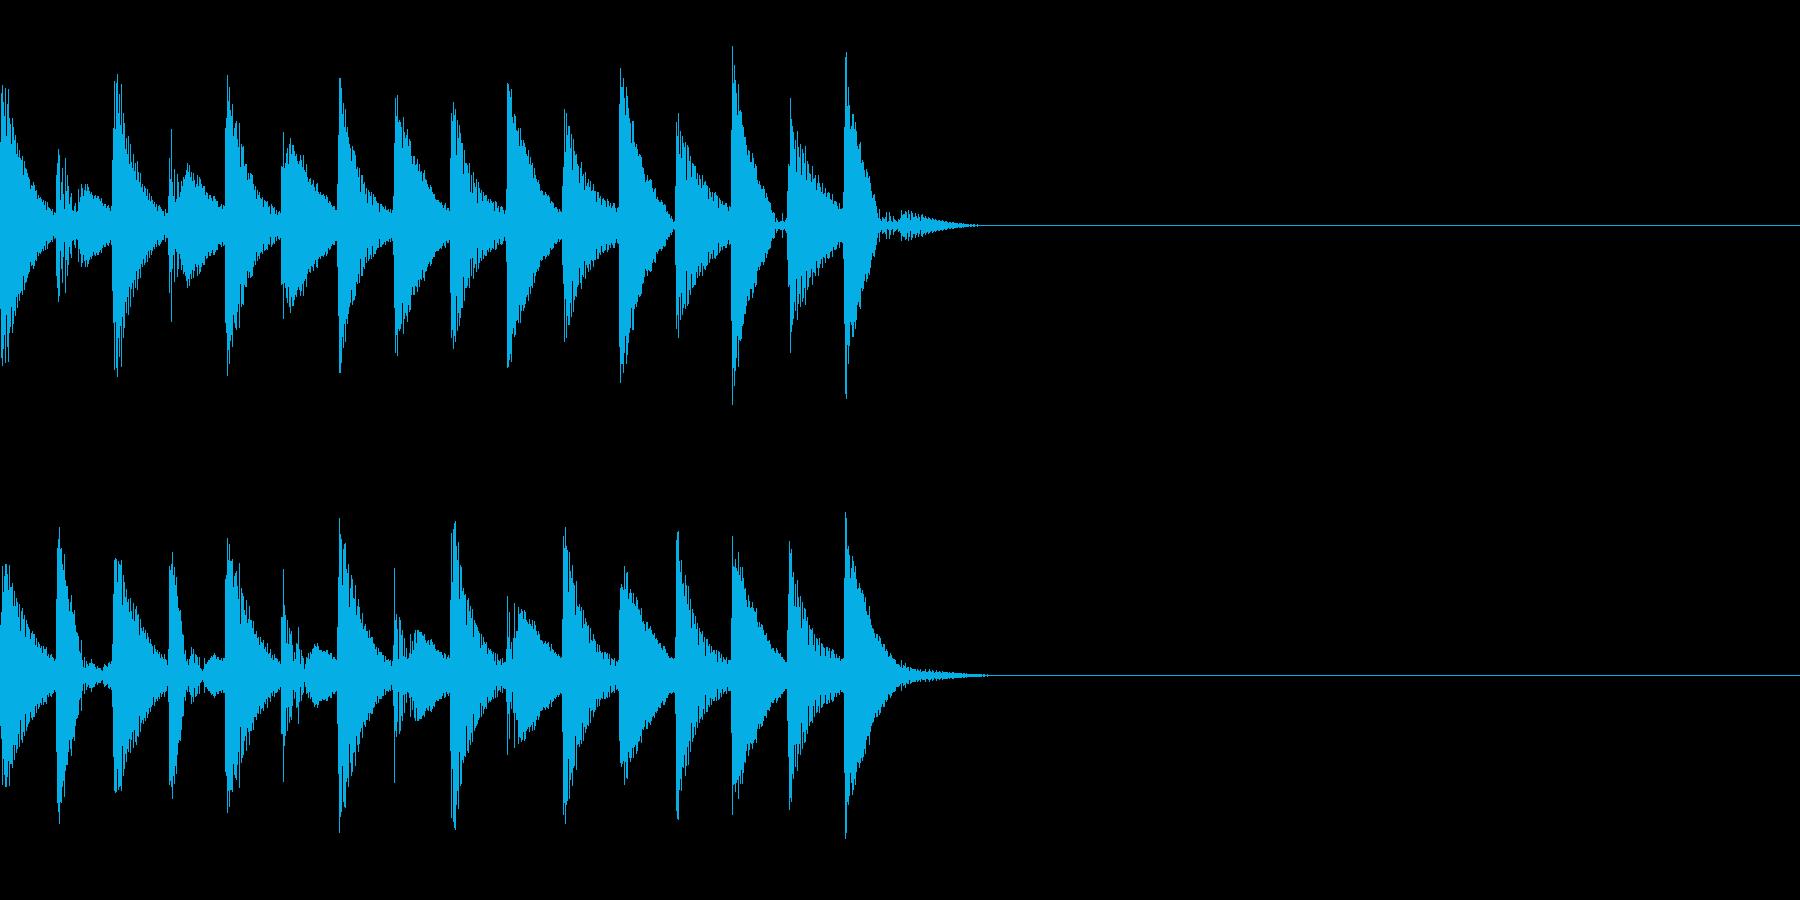 FX・SE/着信音/コール/アラーム/1の再生済みの波形